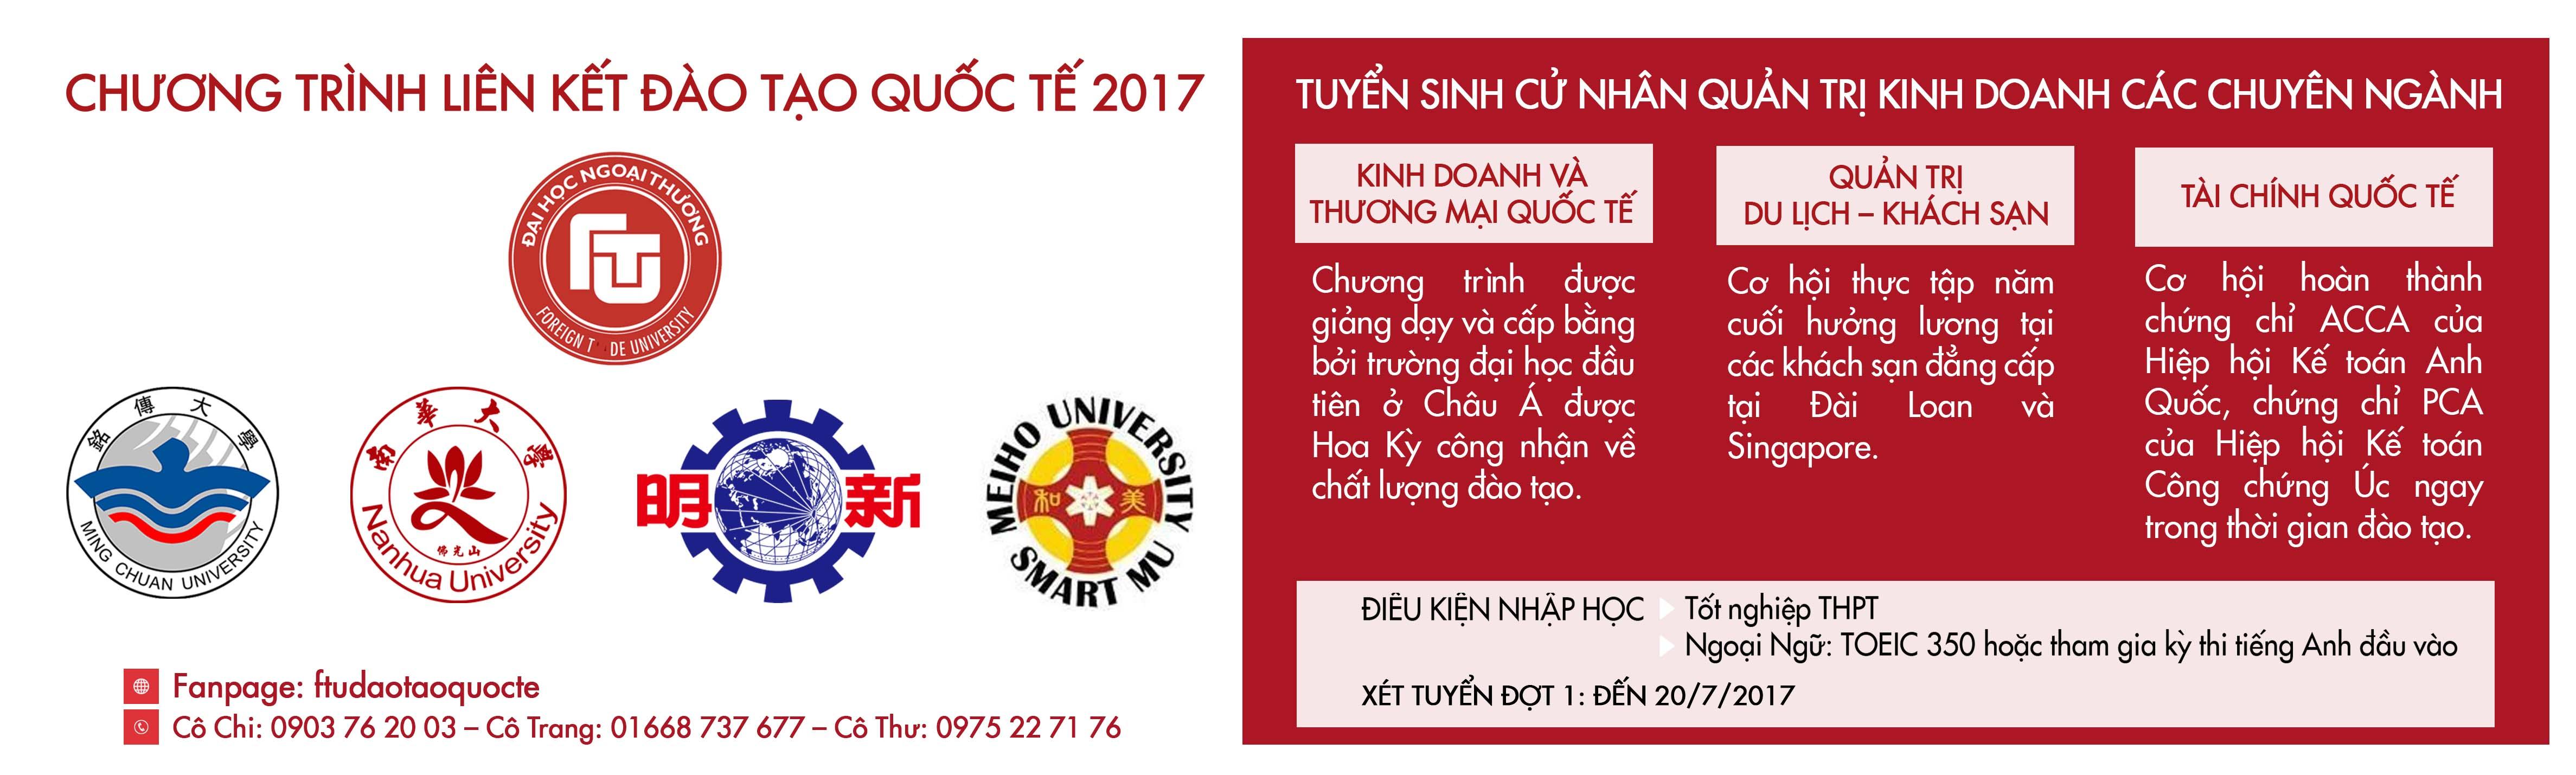 http://icccftu.vn/thong-bao-xet-tuyen-2017